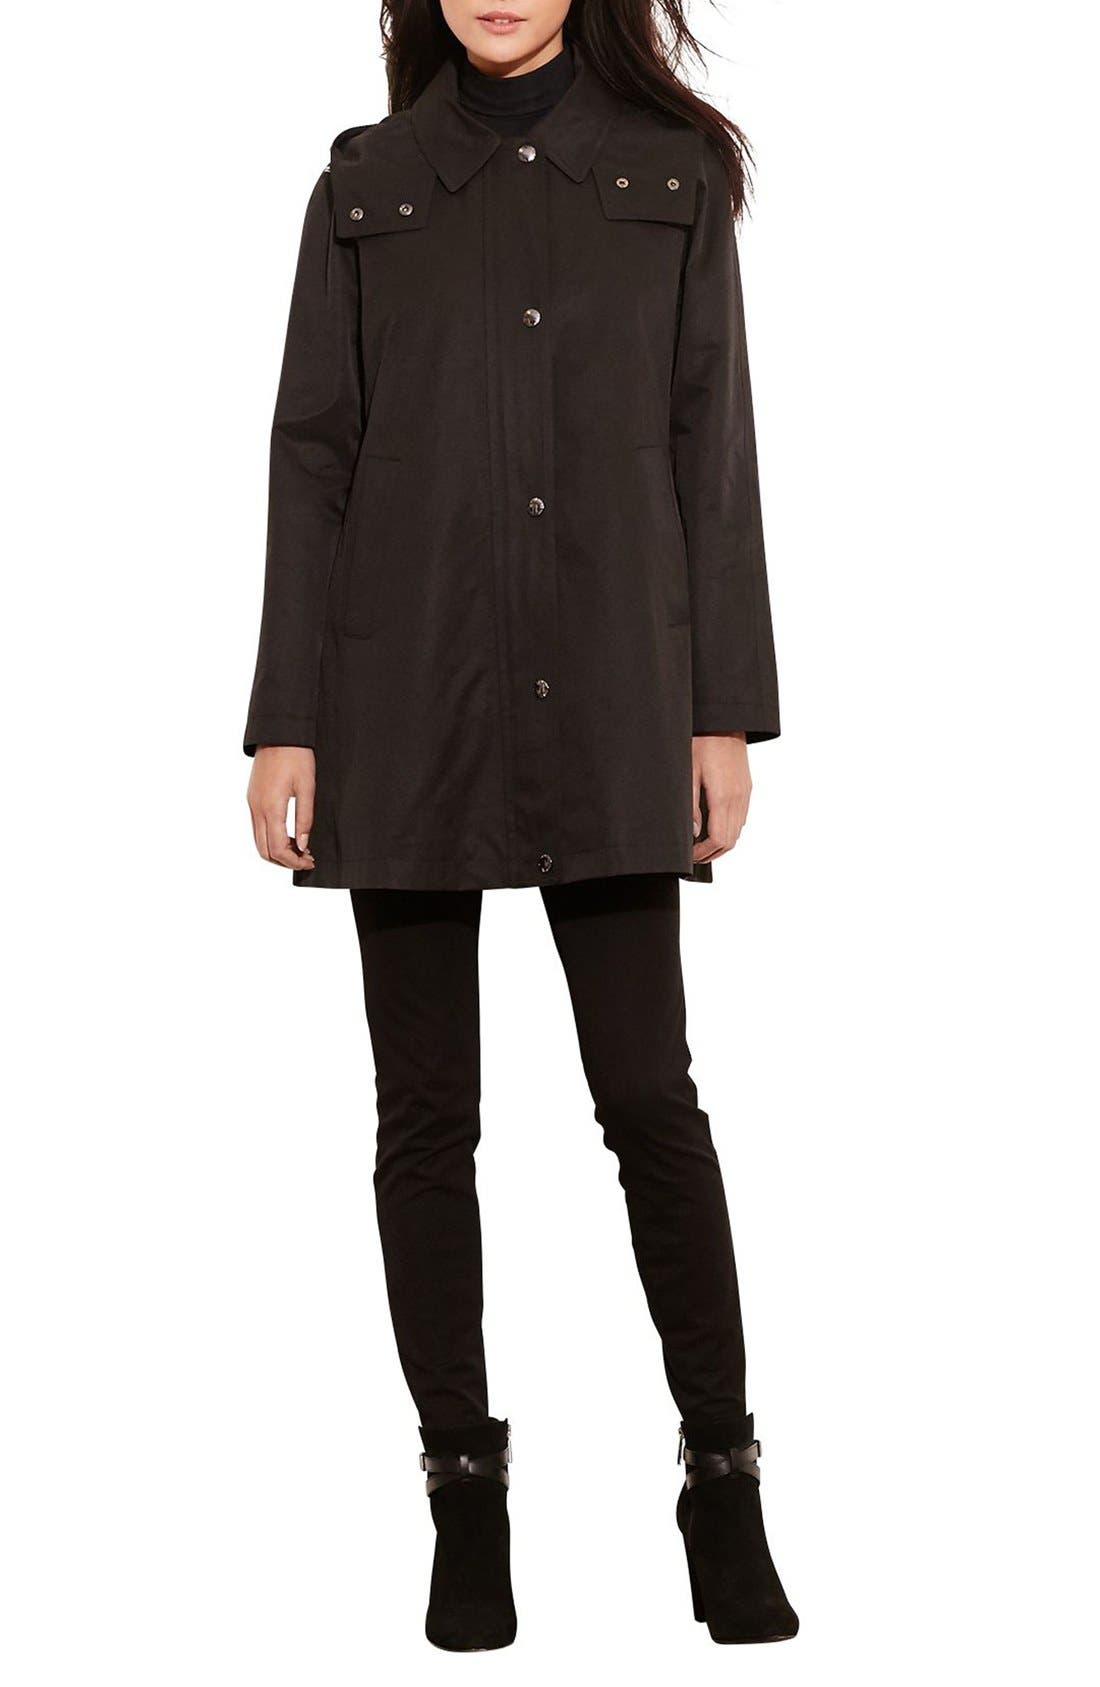 Alternate Image 1 Selected - Lauren Ralph Lauren A-Line Jacket with Removable Liner